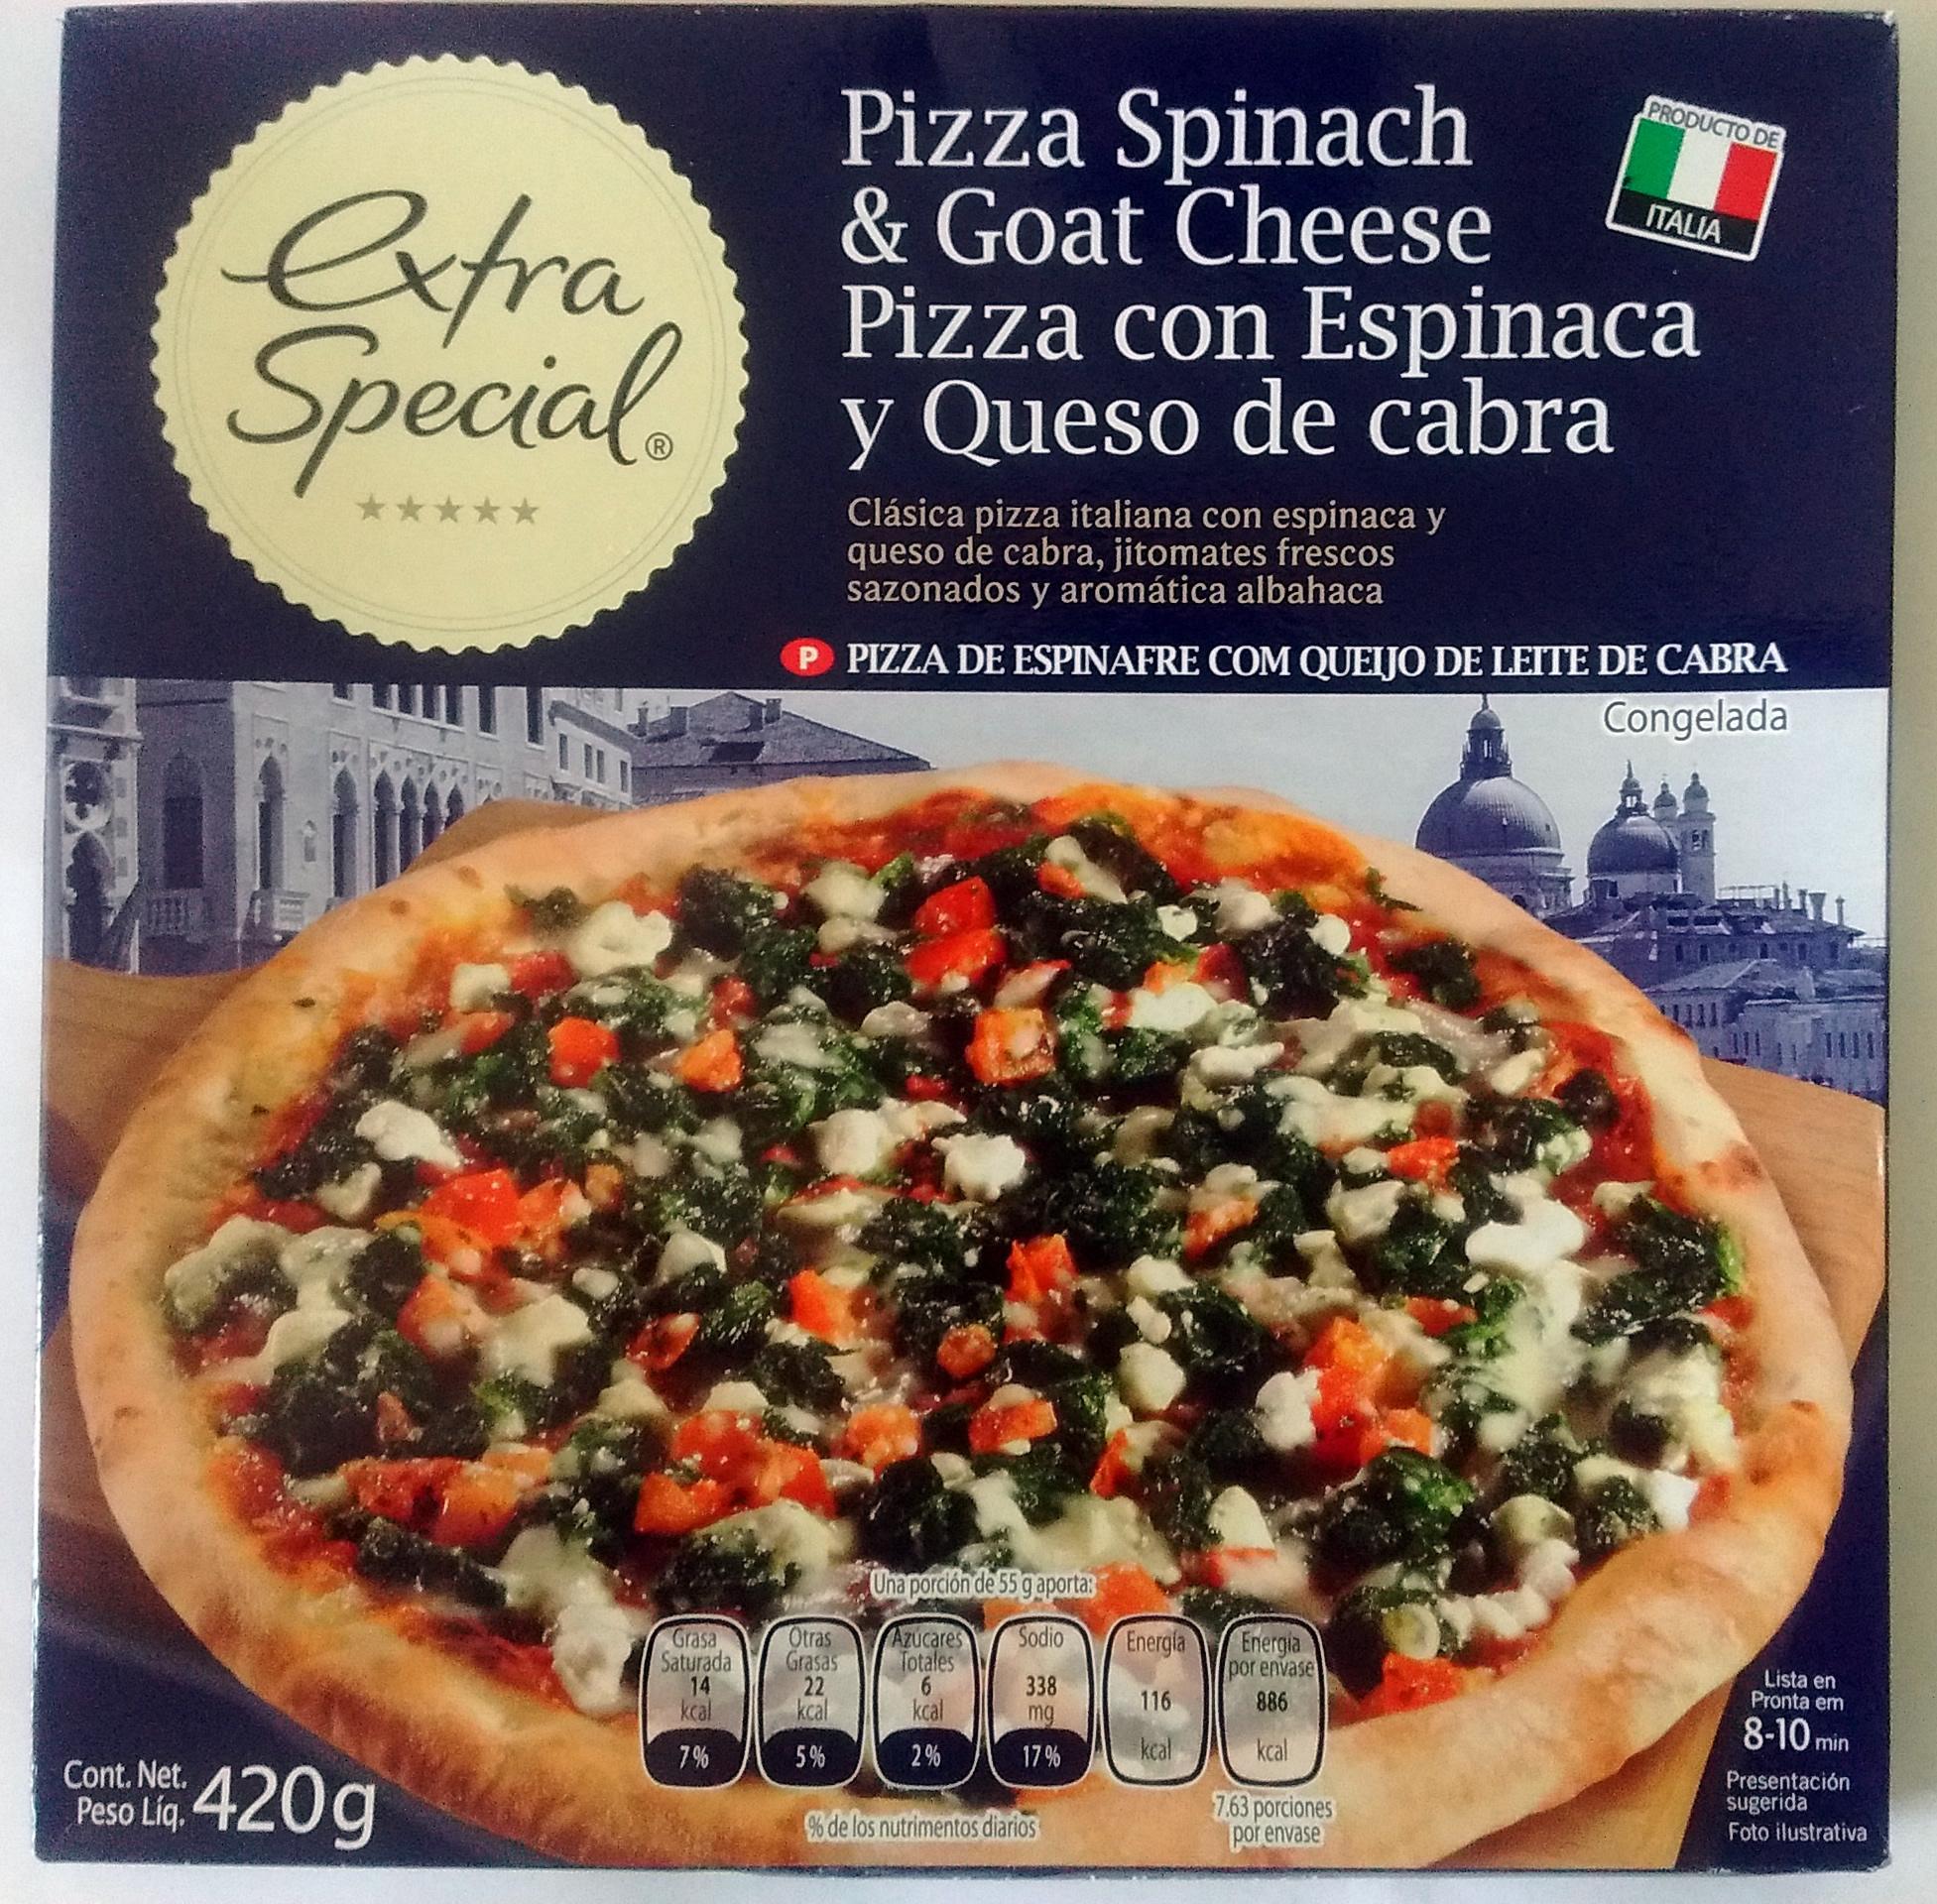 Walmart Toltecas: Pizzas Extra Special